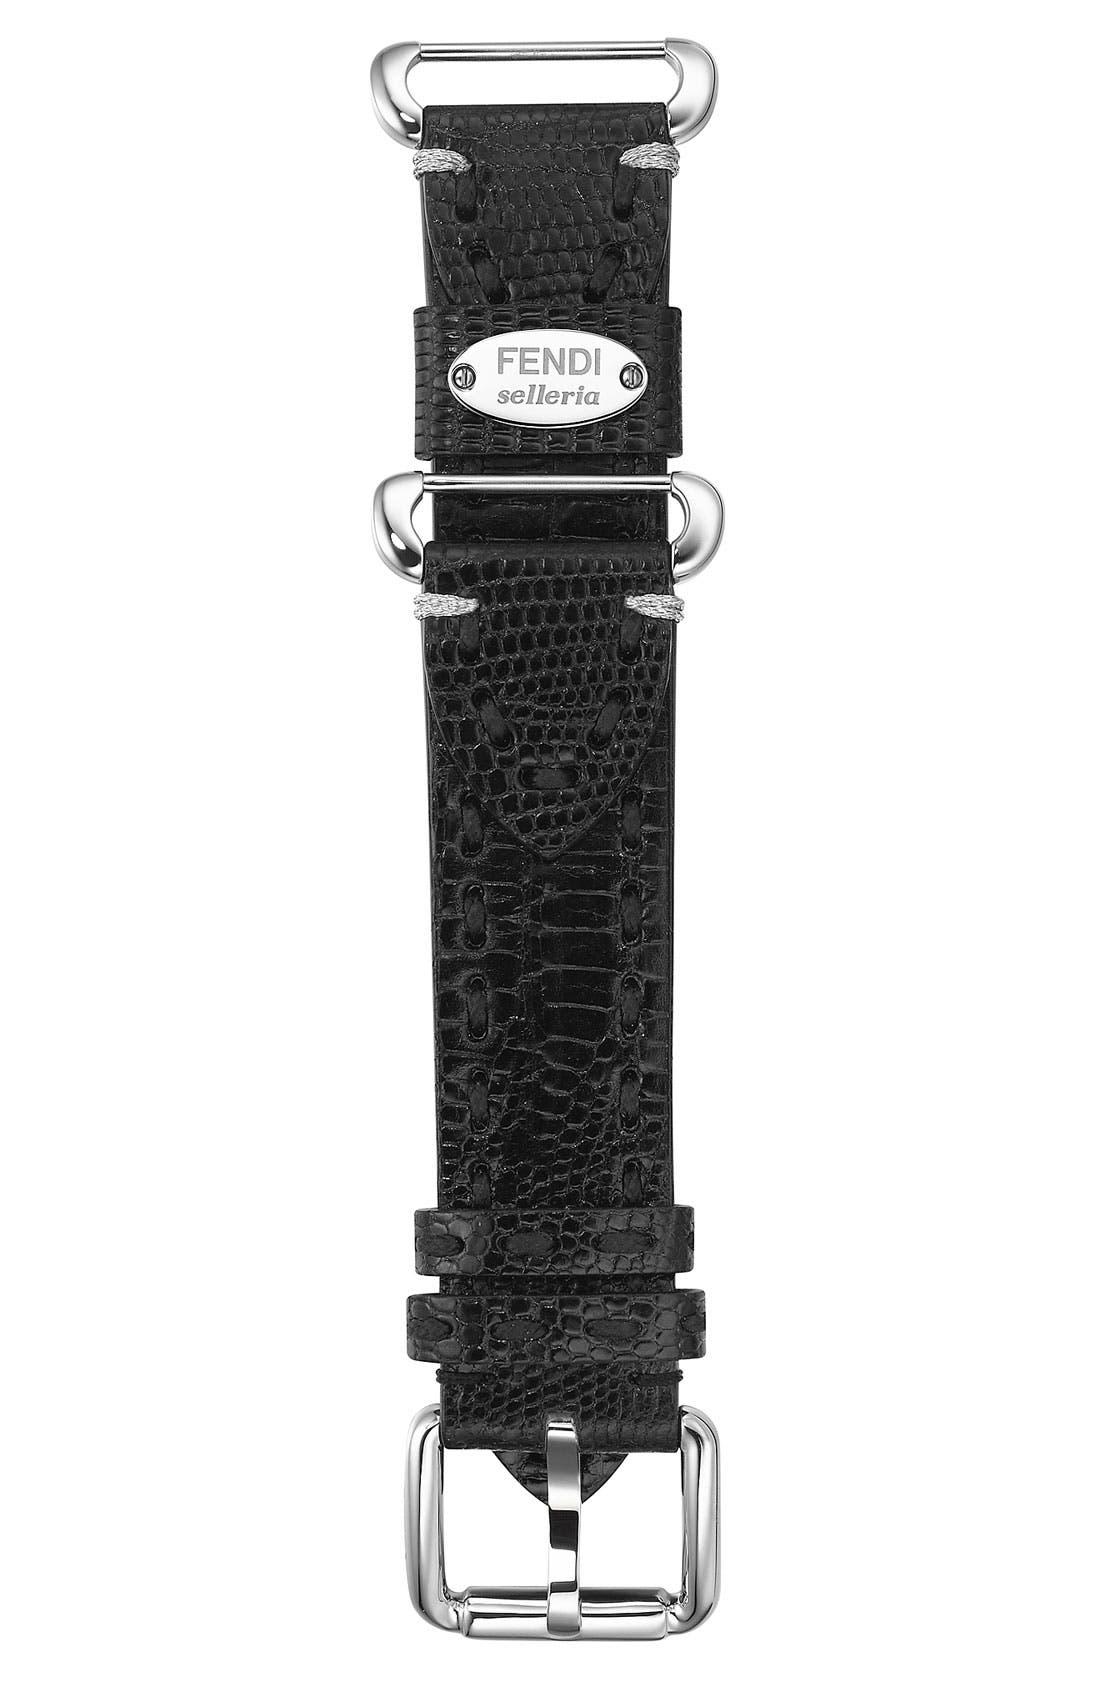 Alternate Image 1 Selected - Fendi 'Selleria' 18mm Teju Lizardskin Watch Strap